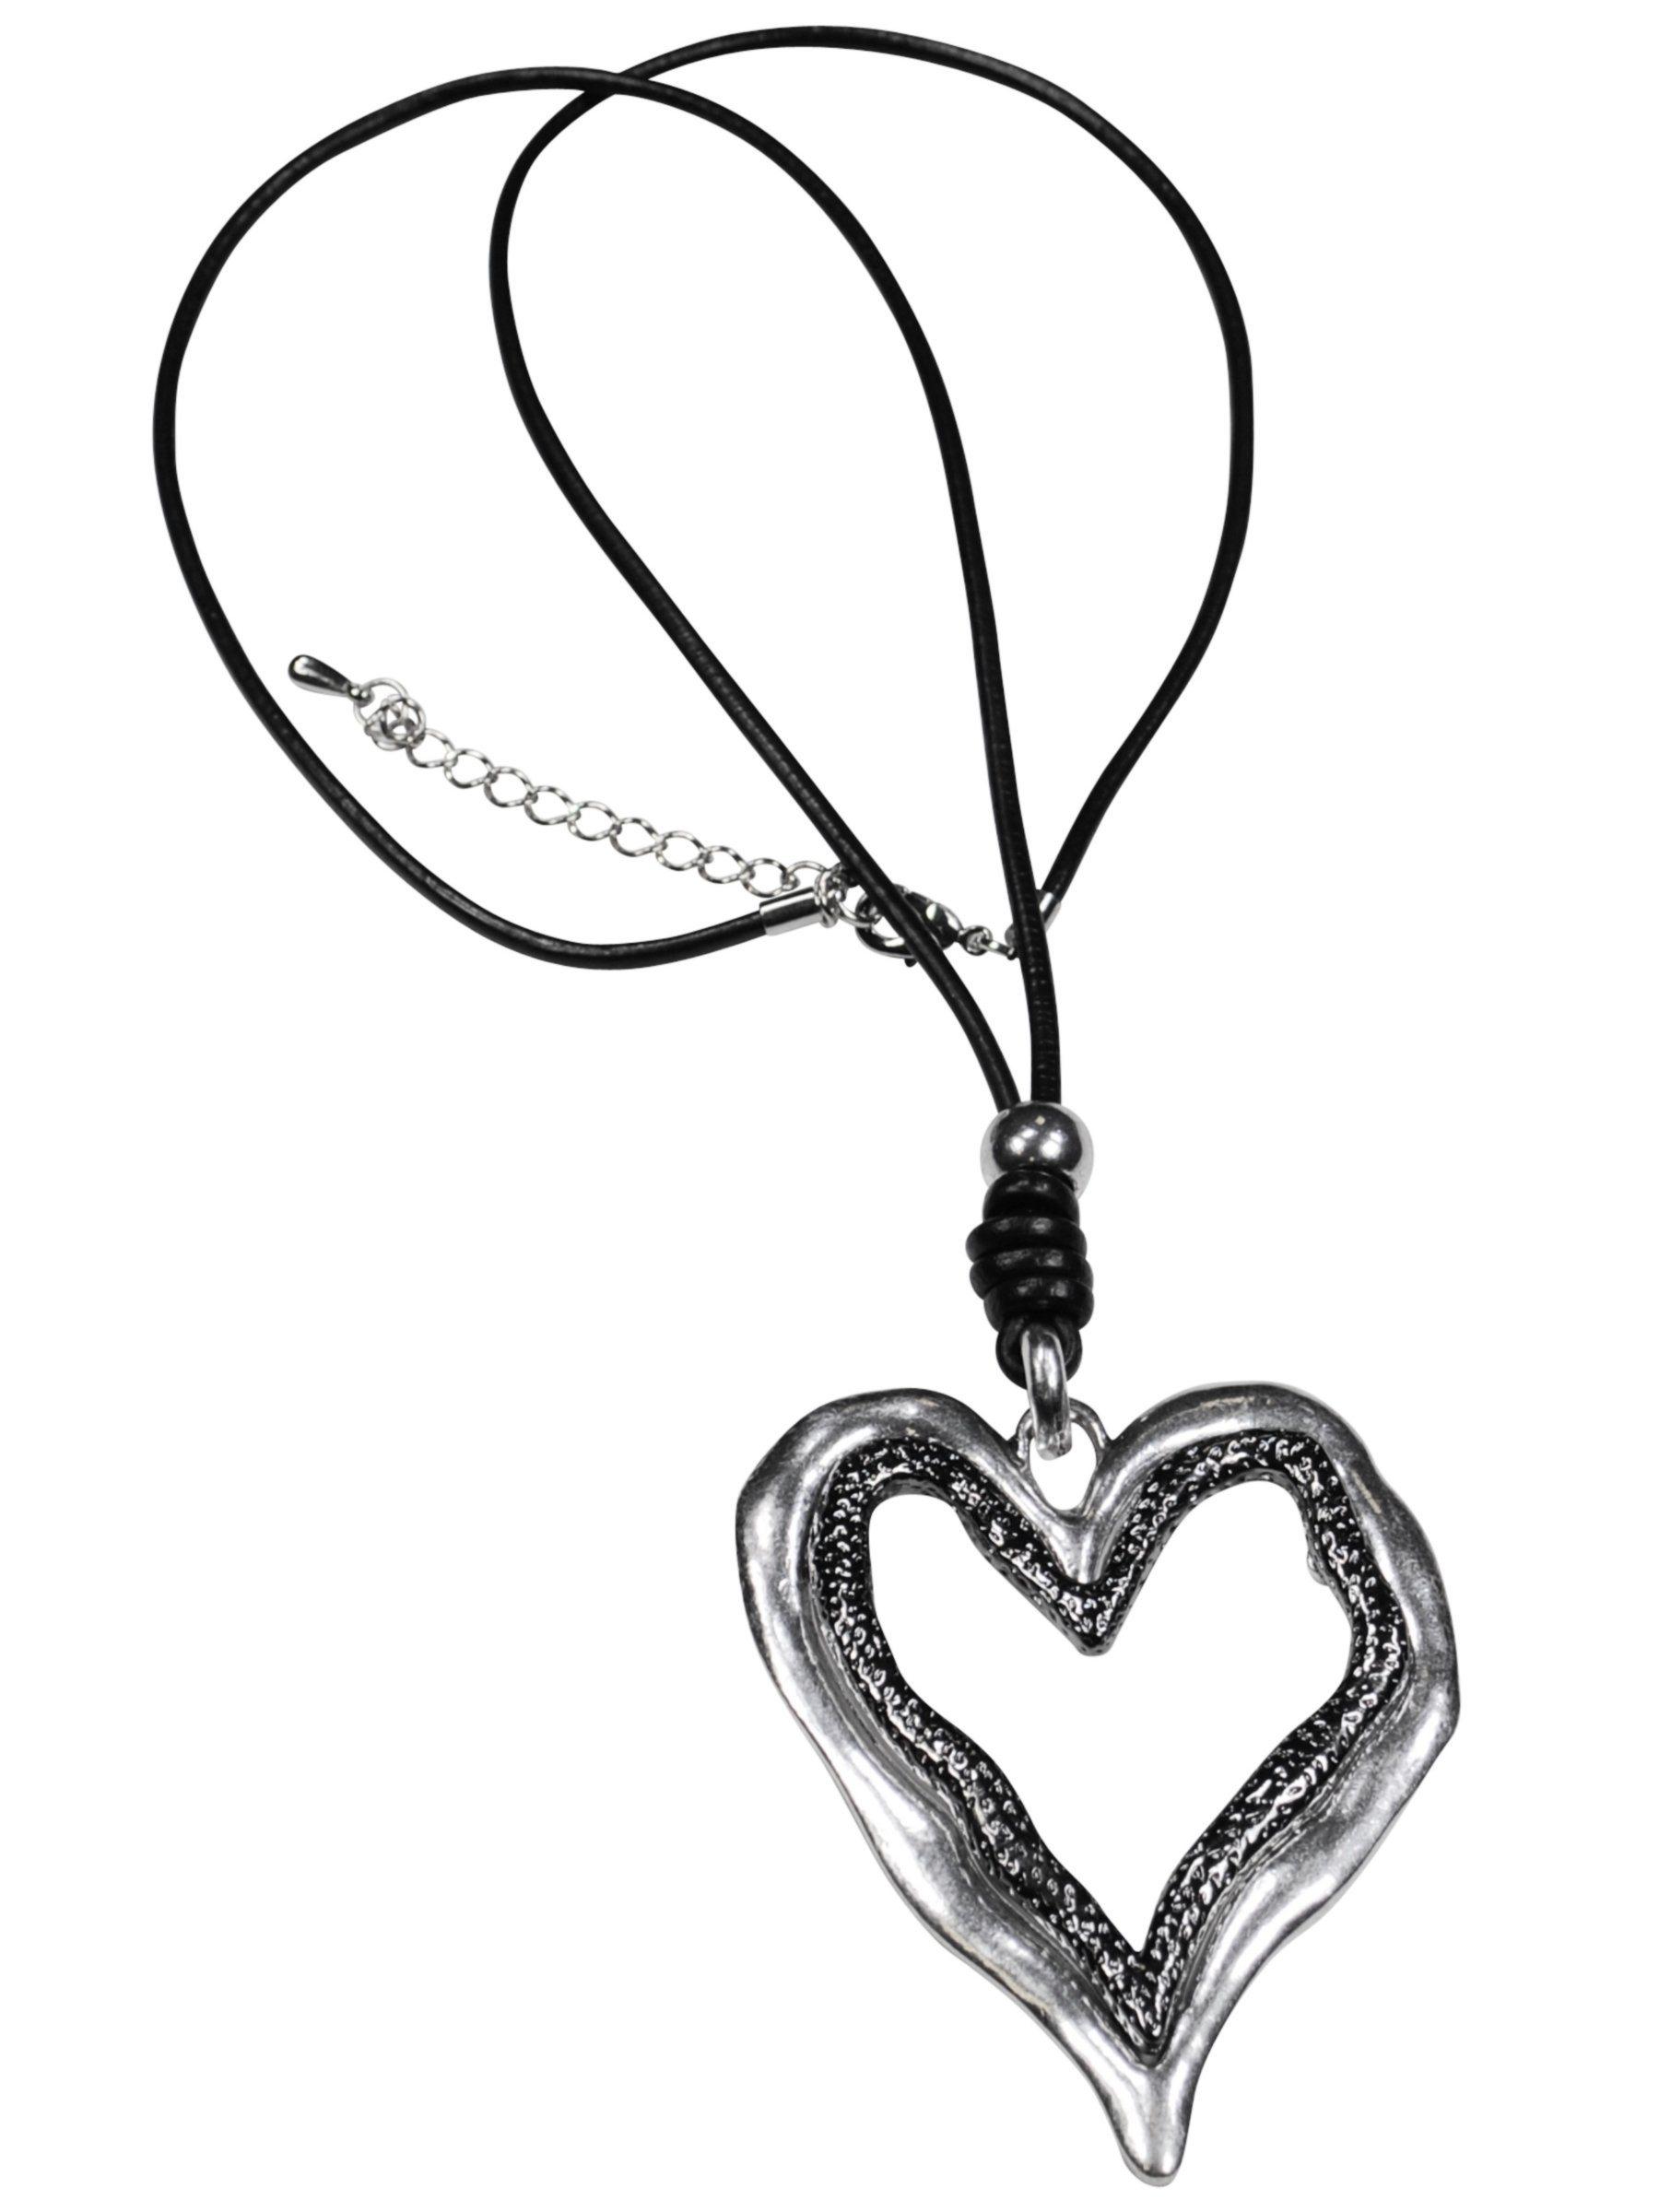 Simone Erto Kette mit Anhänger »Kethe« Kette mit Herz   Schmuck > Halsketten > Herzketten   Simone Erto